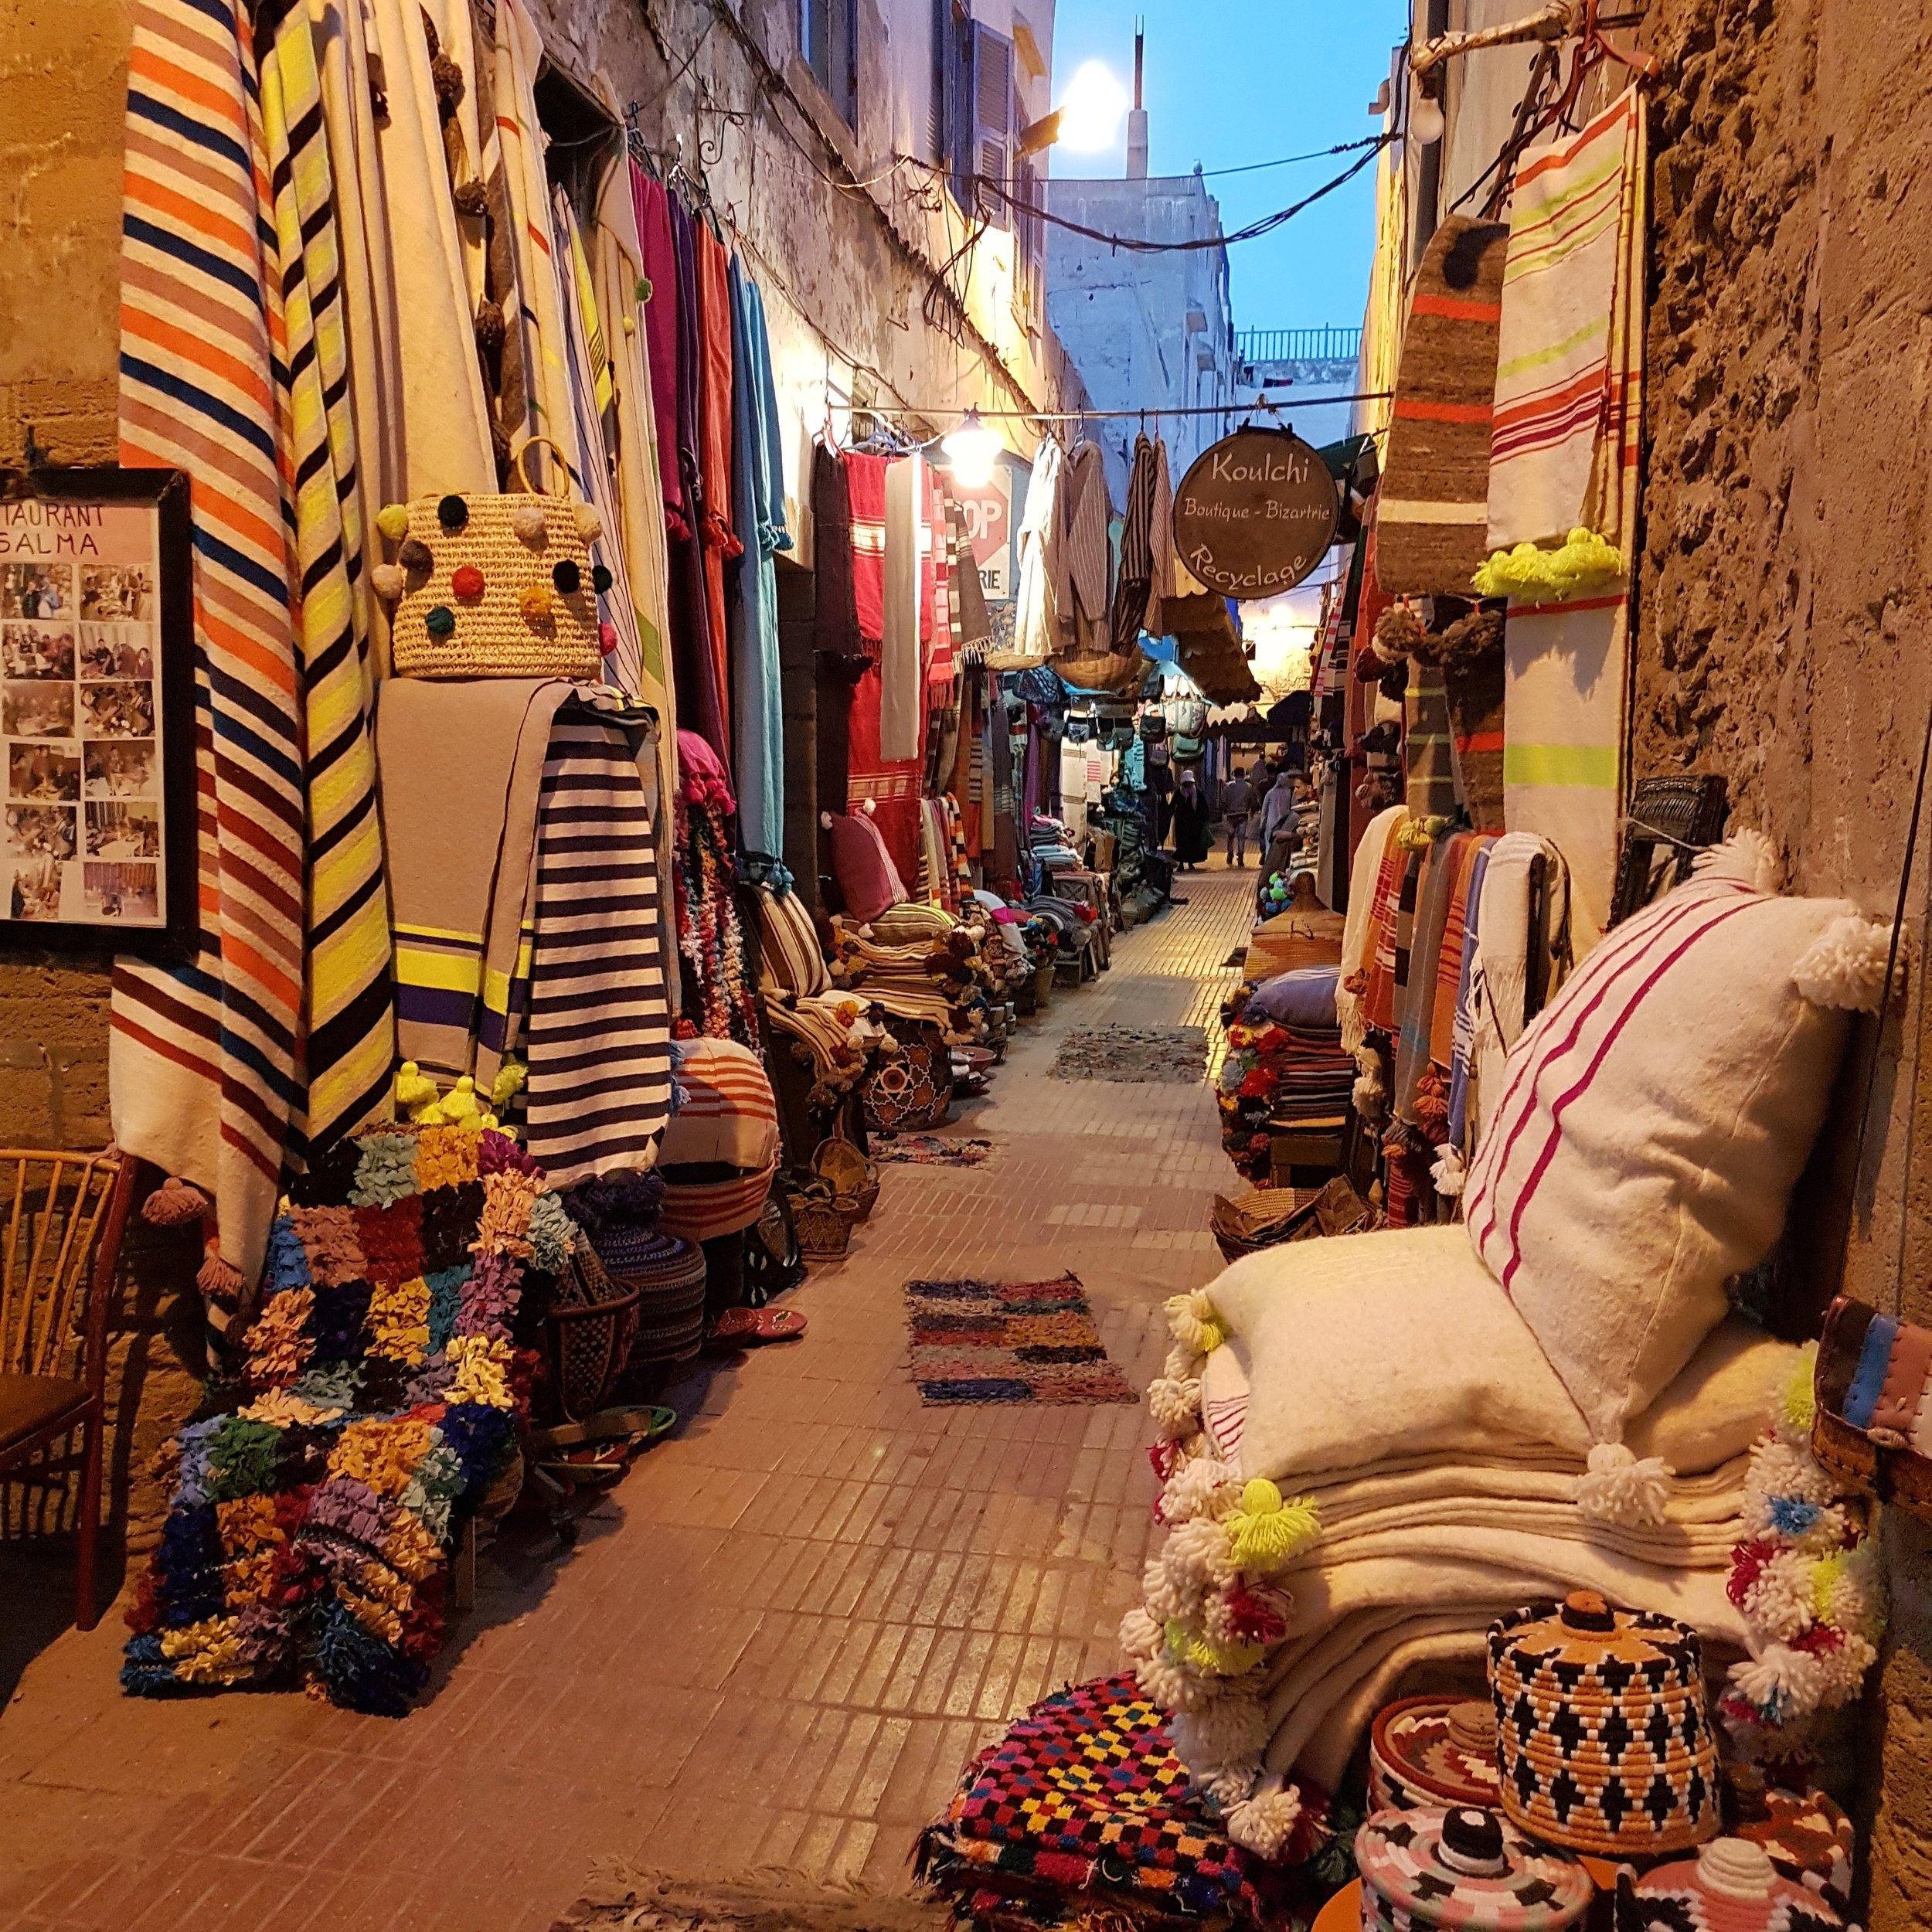 AnnaCoxCushions_Production_Marocco_1.jpg